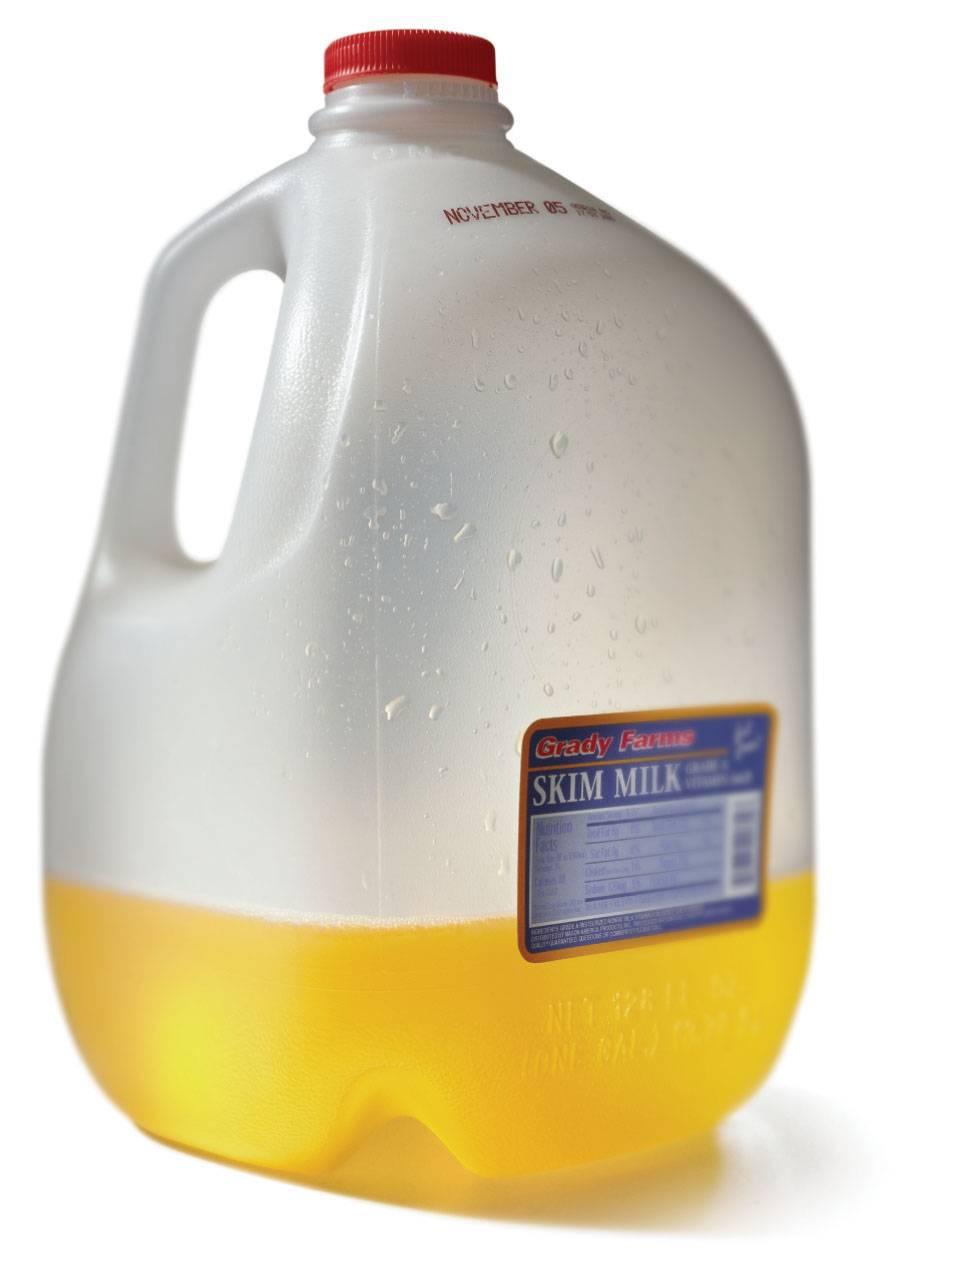 piss_bottle_t1000.jpg